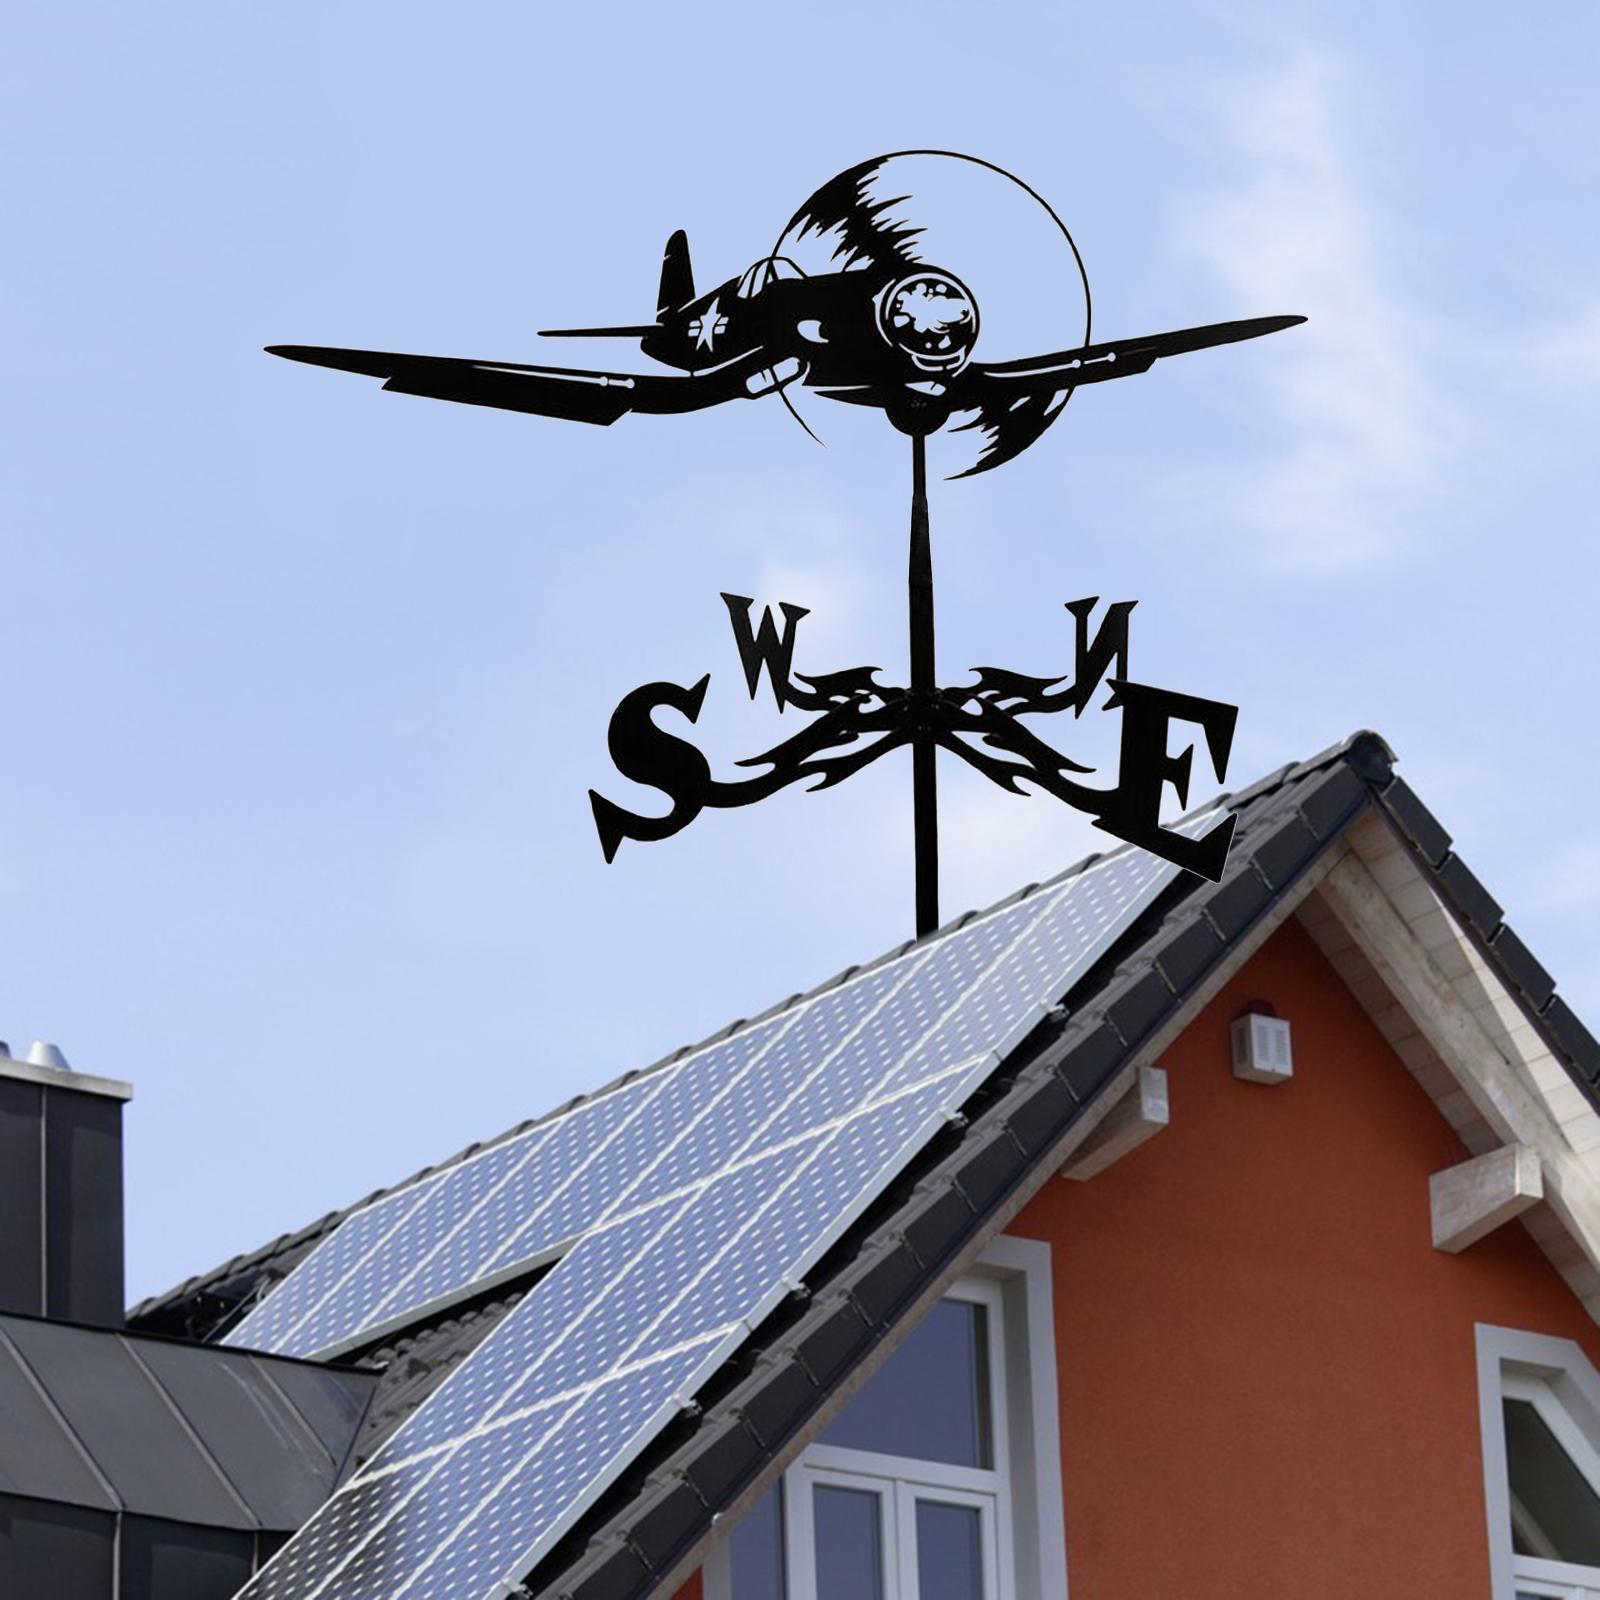 Iron Weather Vane Farm Black Yard Roof Metal Weathervane Cupolas Durable